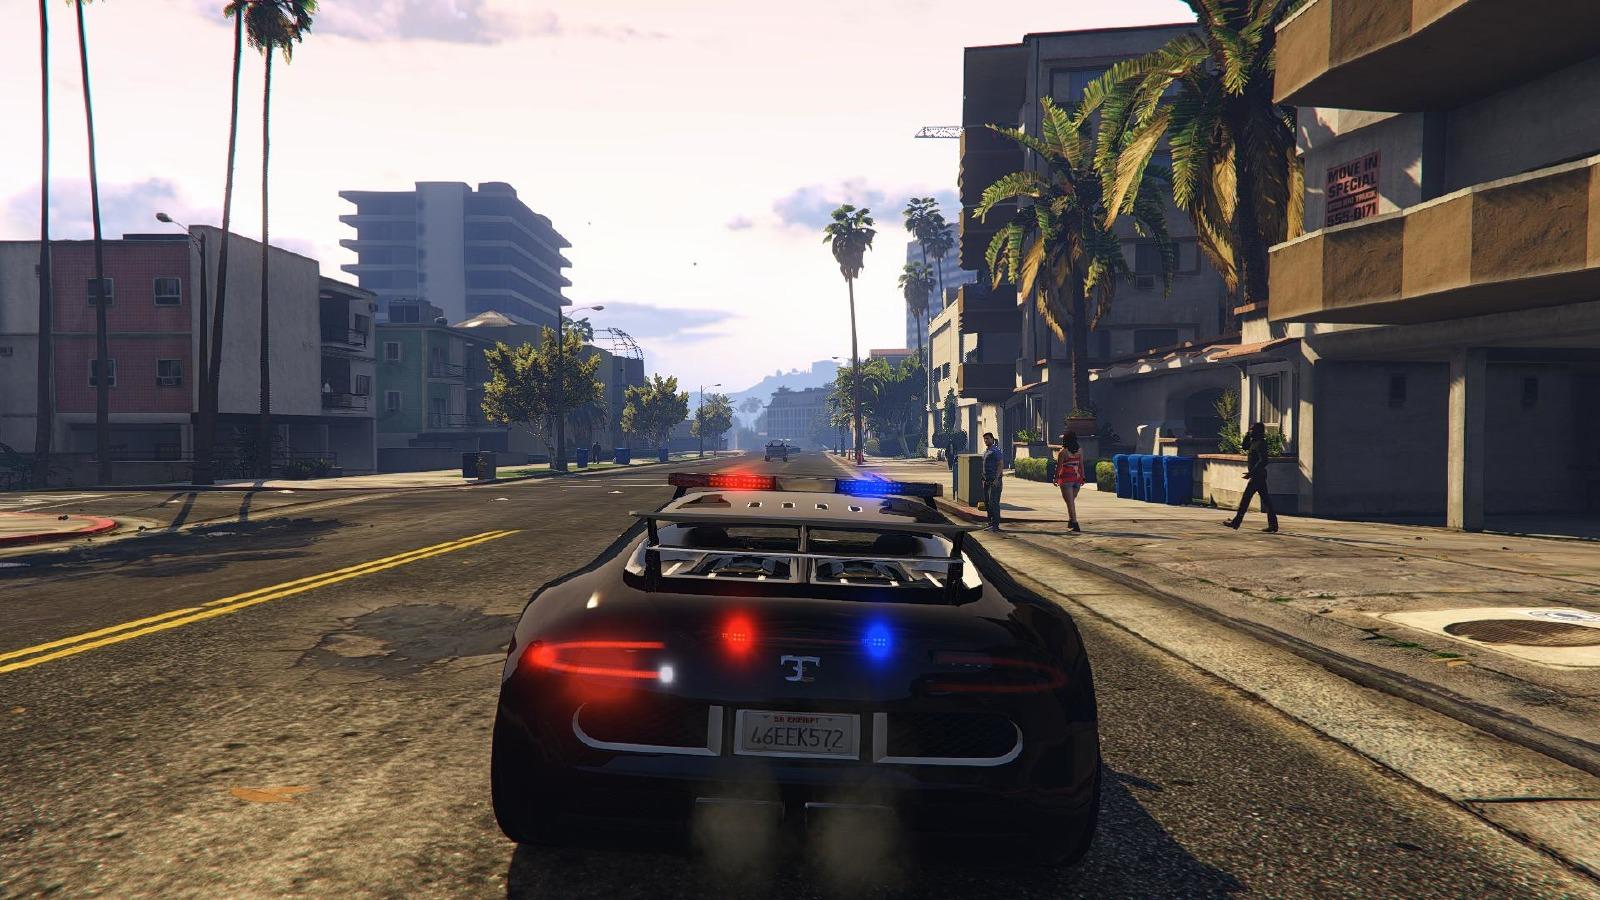 Bugatti Adder Police Lspd Vehicules Pour Gta V Sur